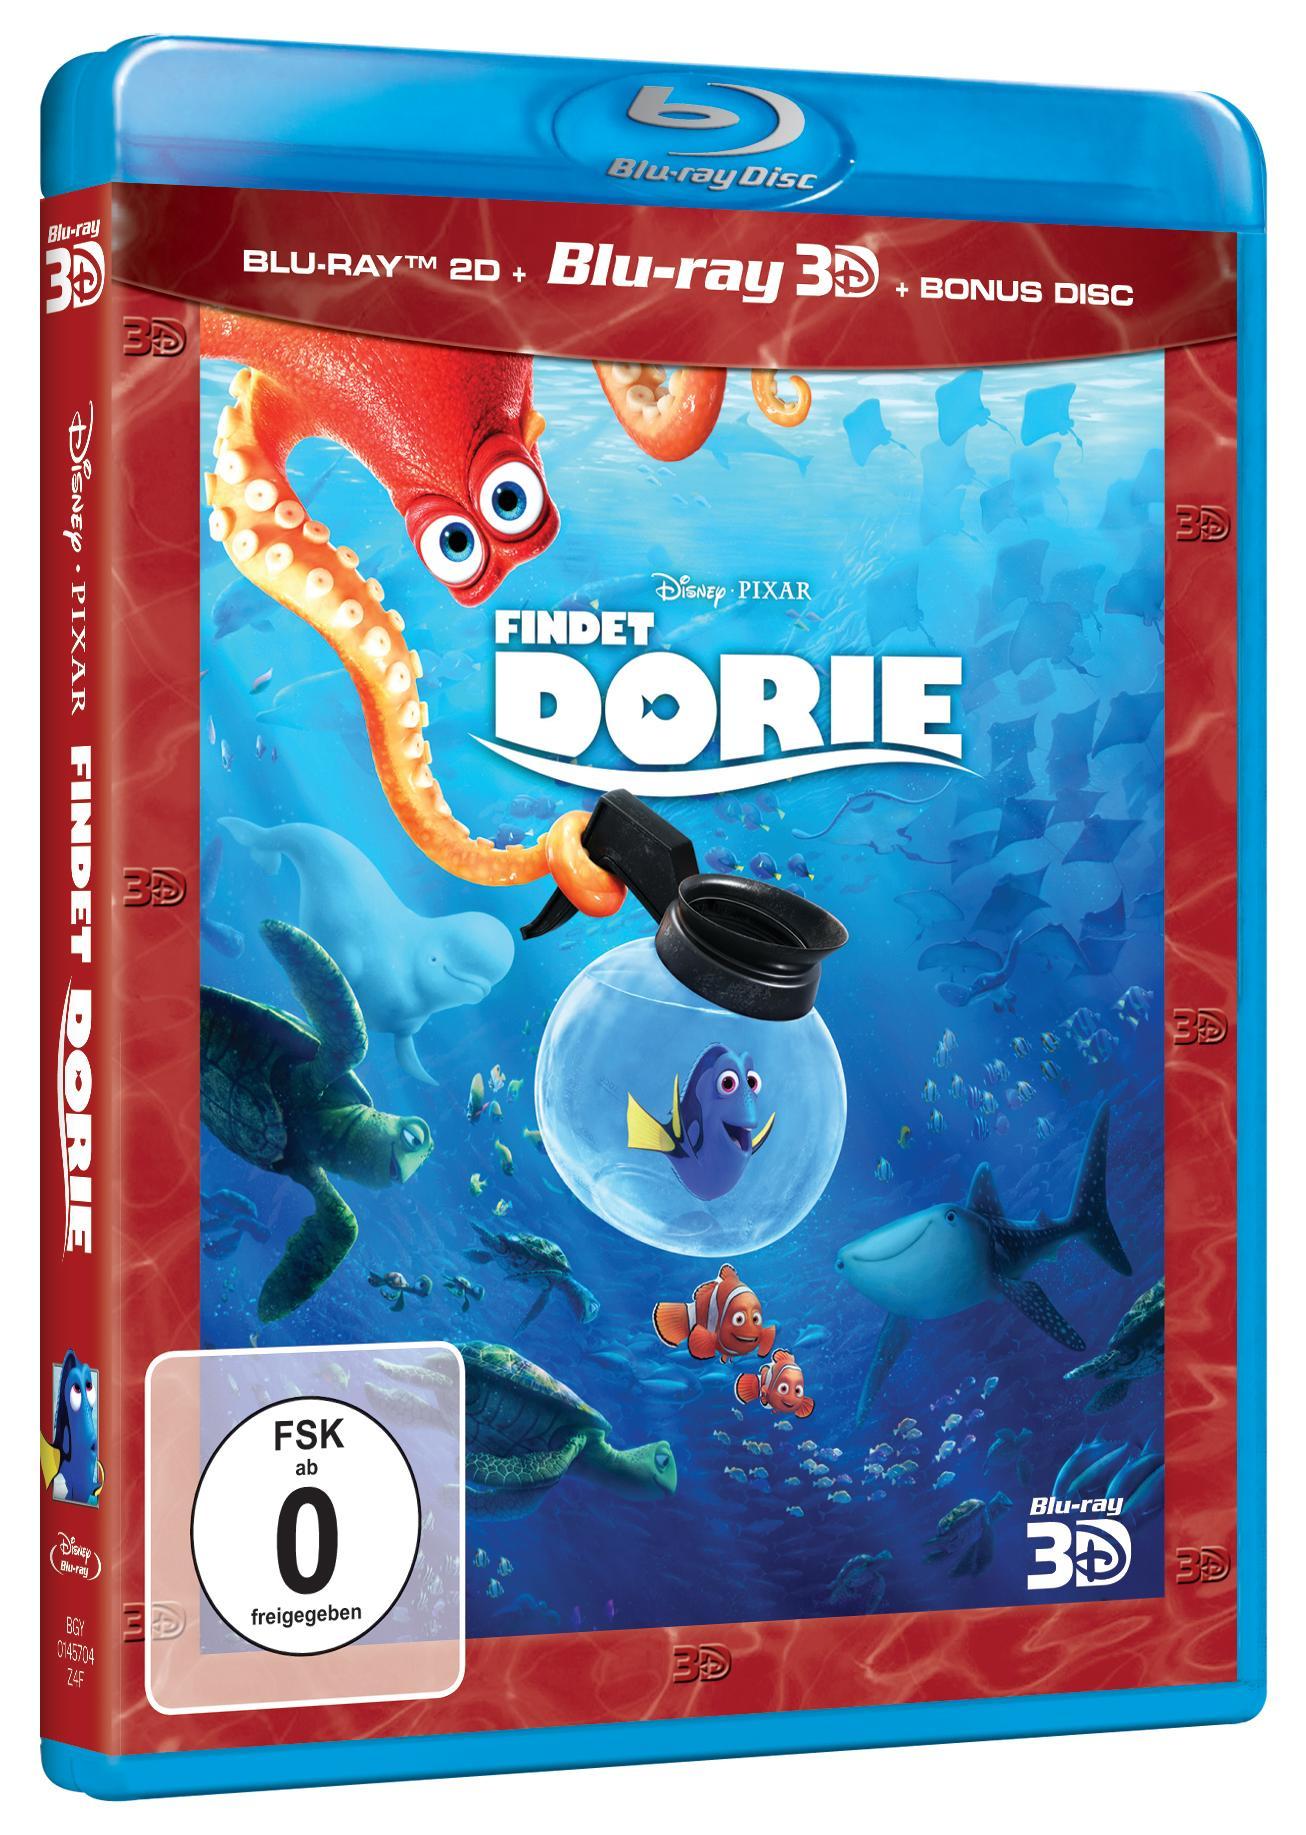 Disney Pixar - Findet Dorie  Blu-Ray 3D